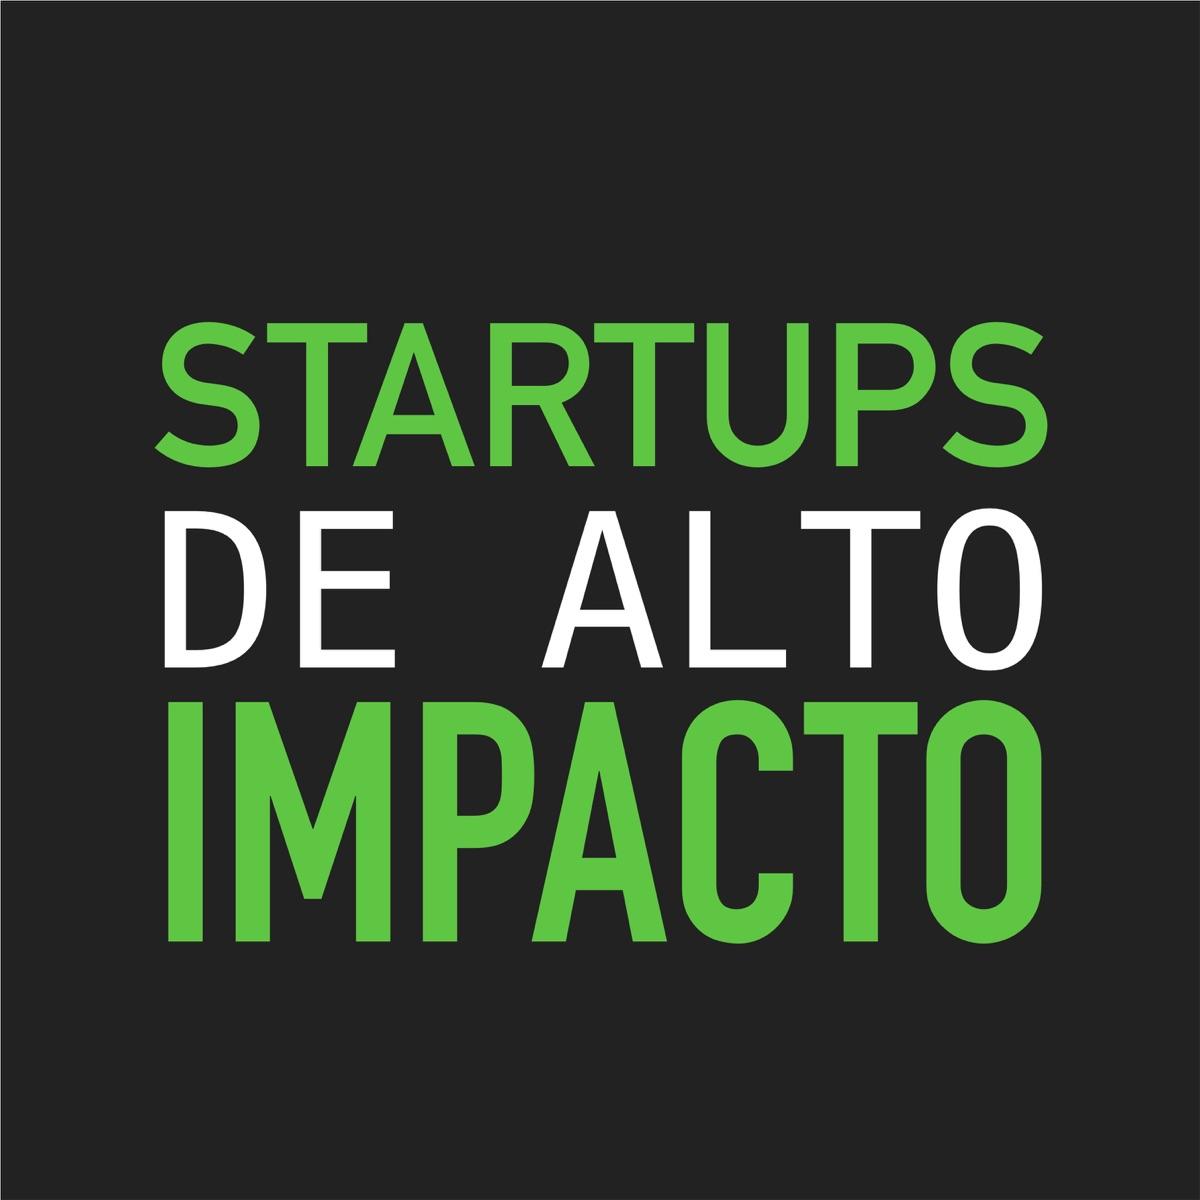 Startup-de-alto-impacto